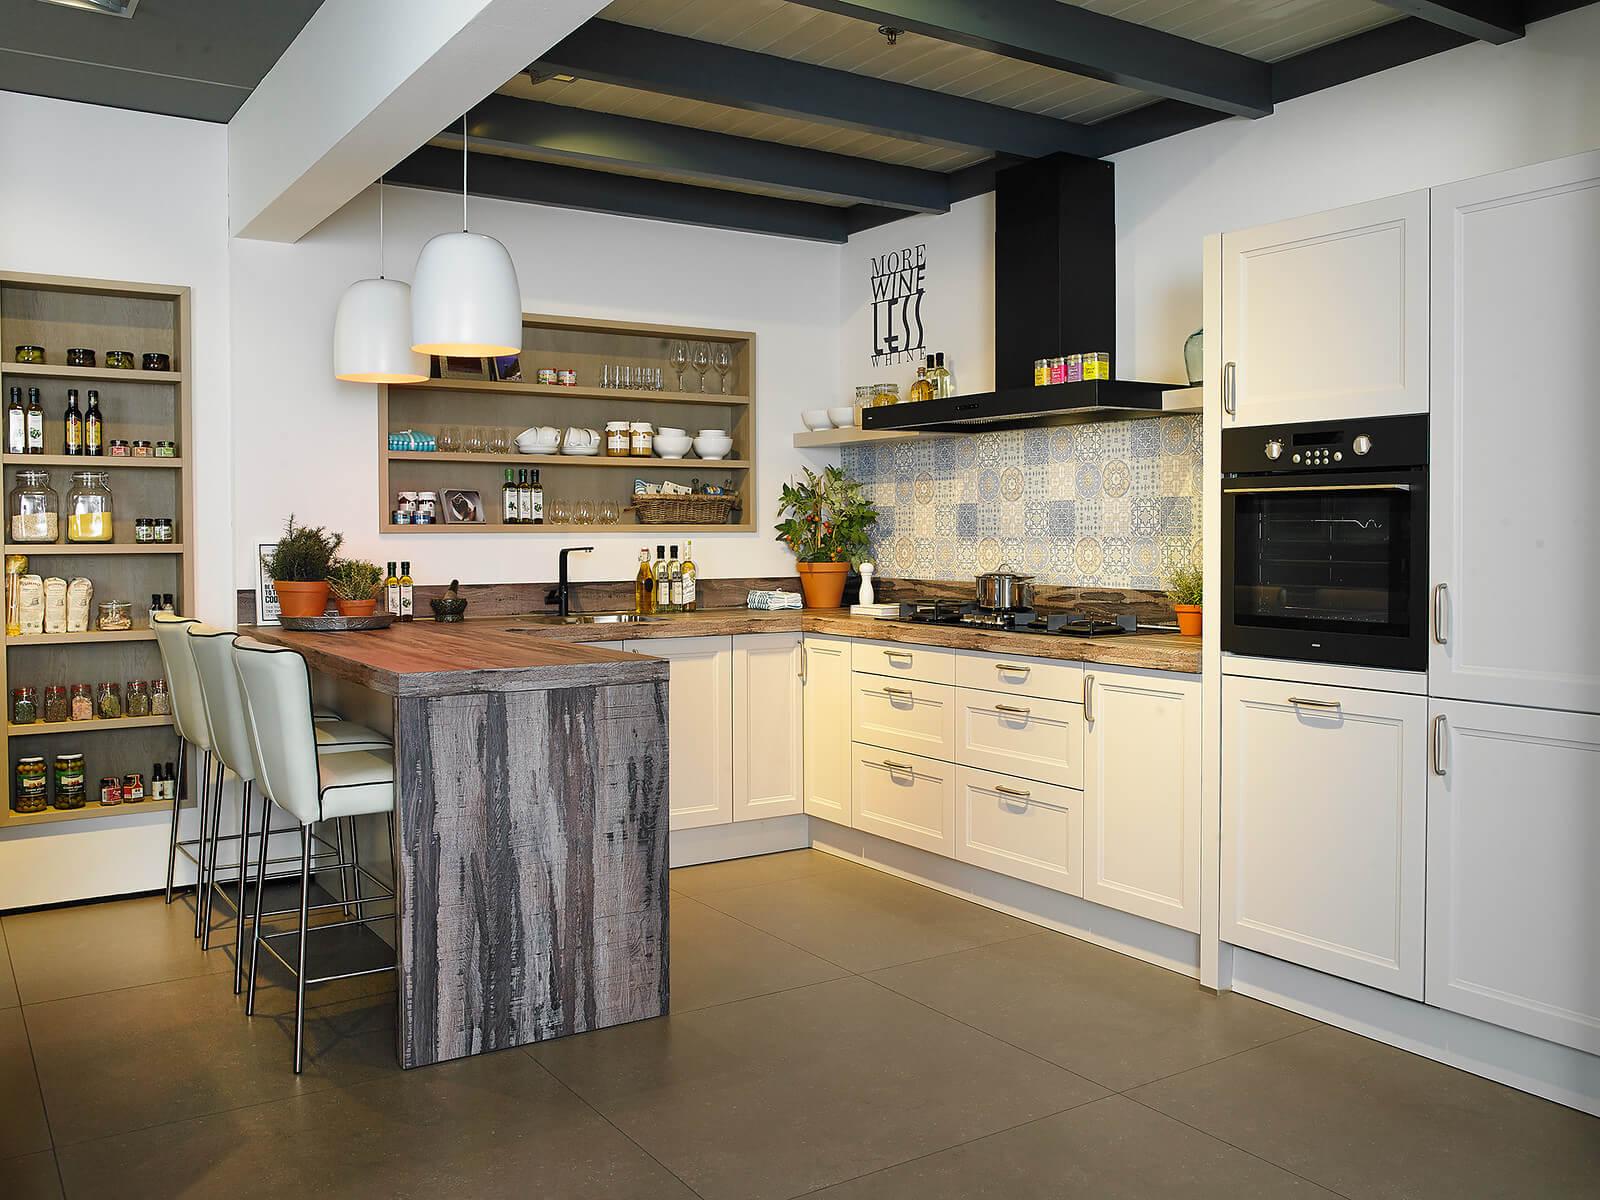 Keukens met bar van Tieleman Keukens